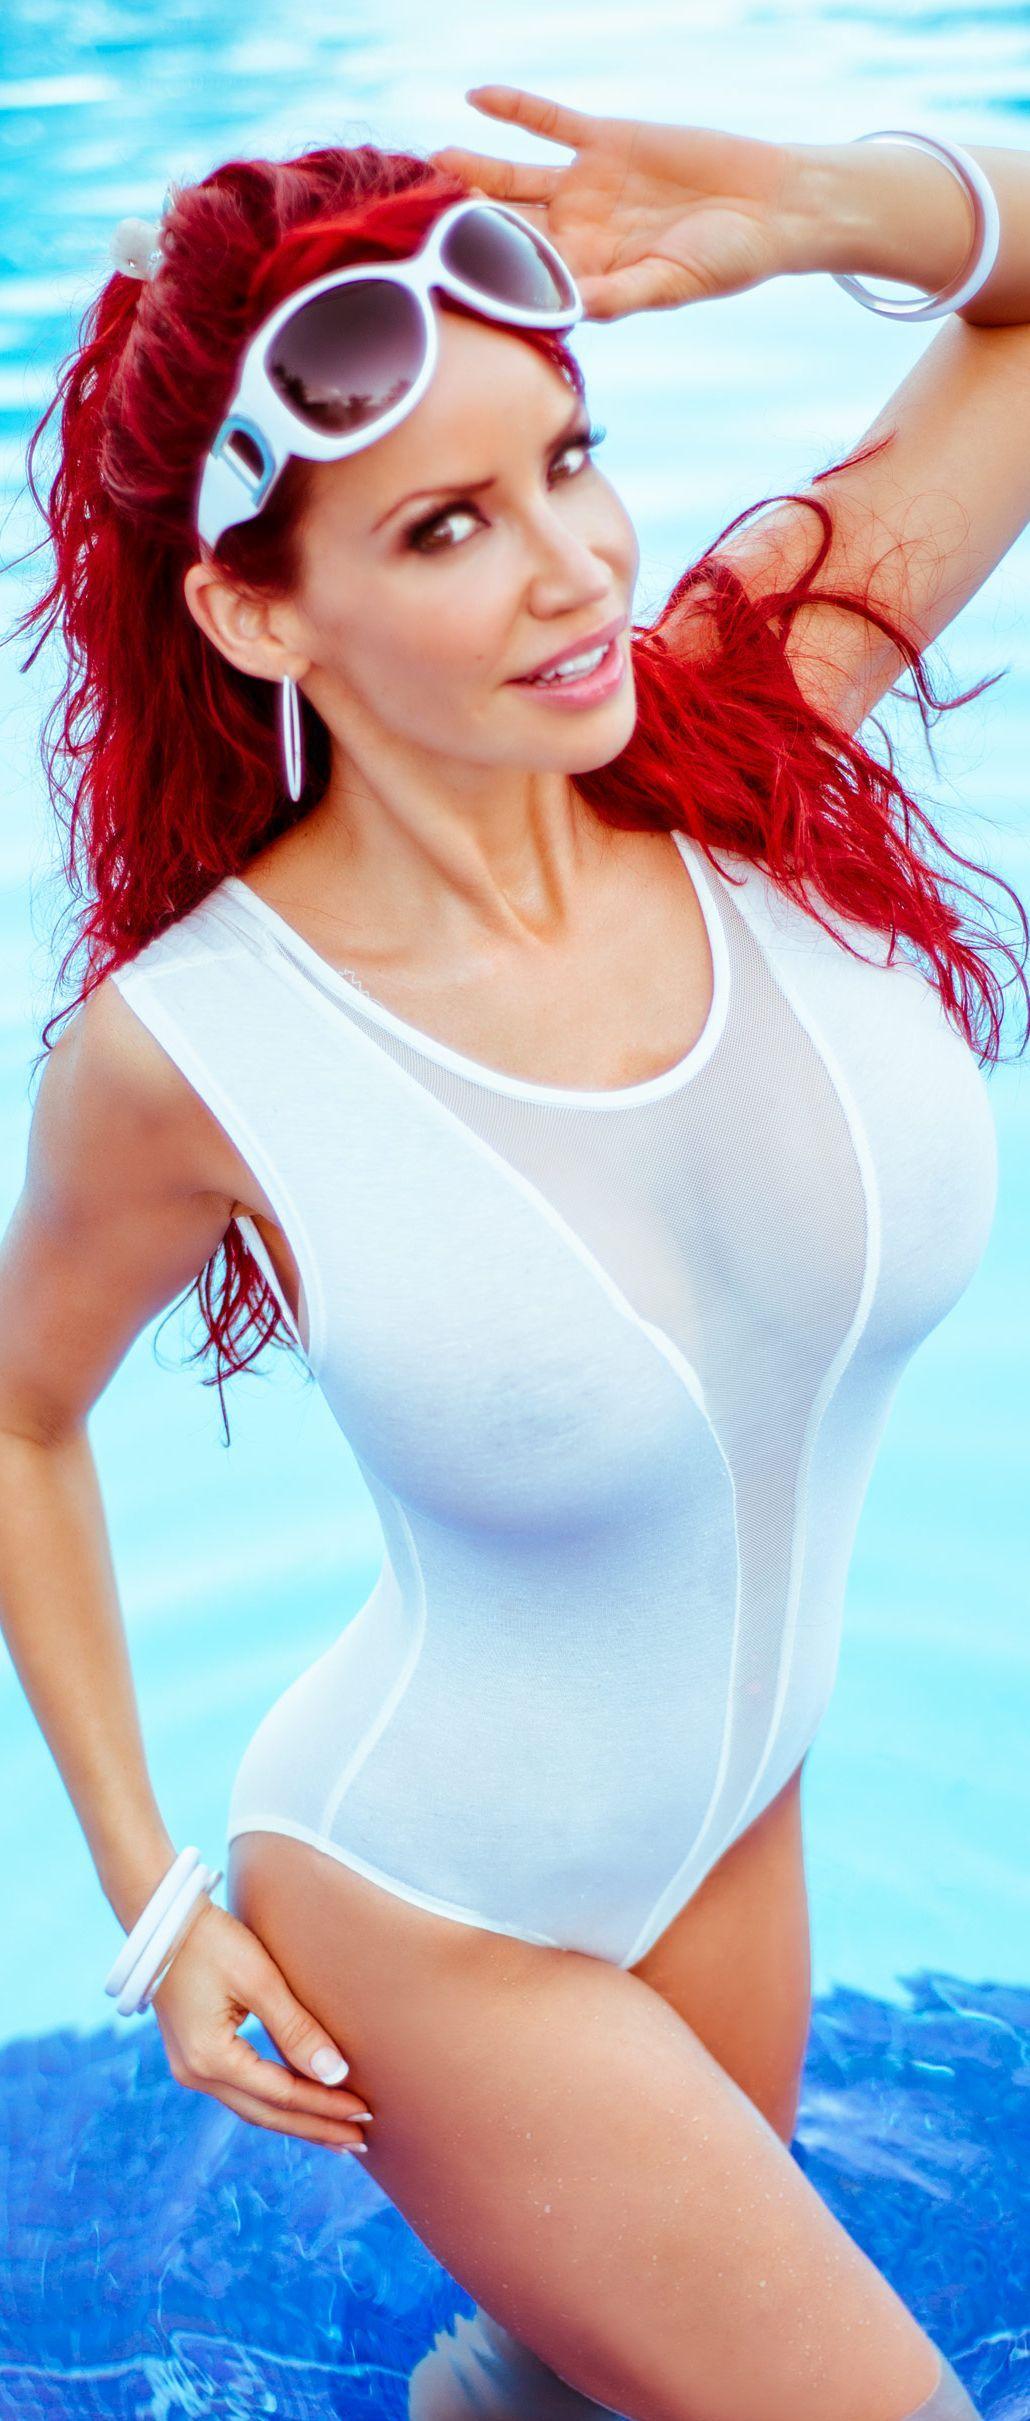 Celebrites Bianca Beauchamp nude photos 2019